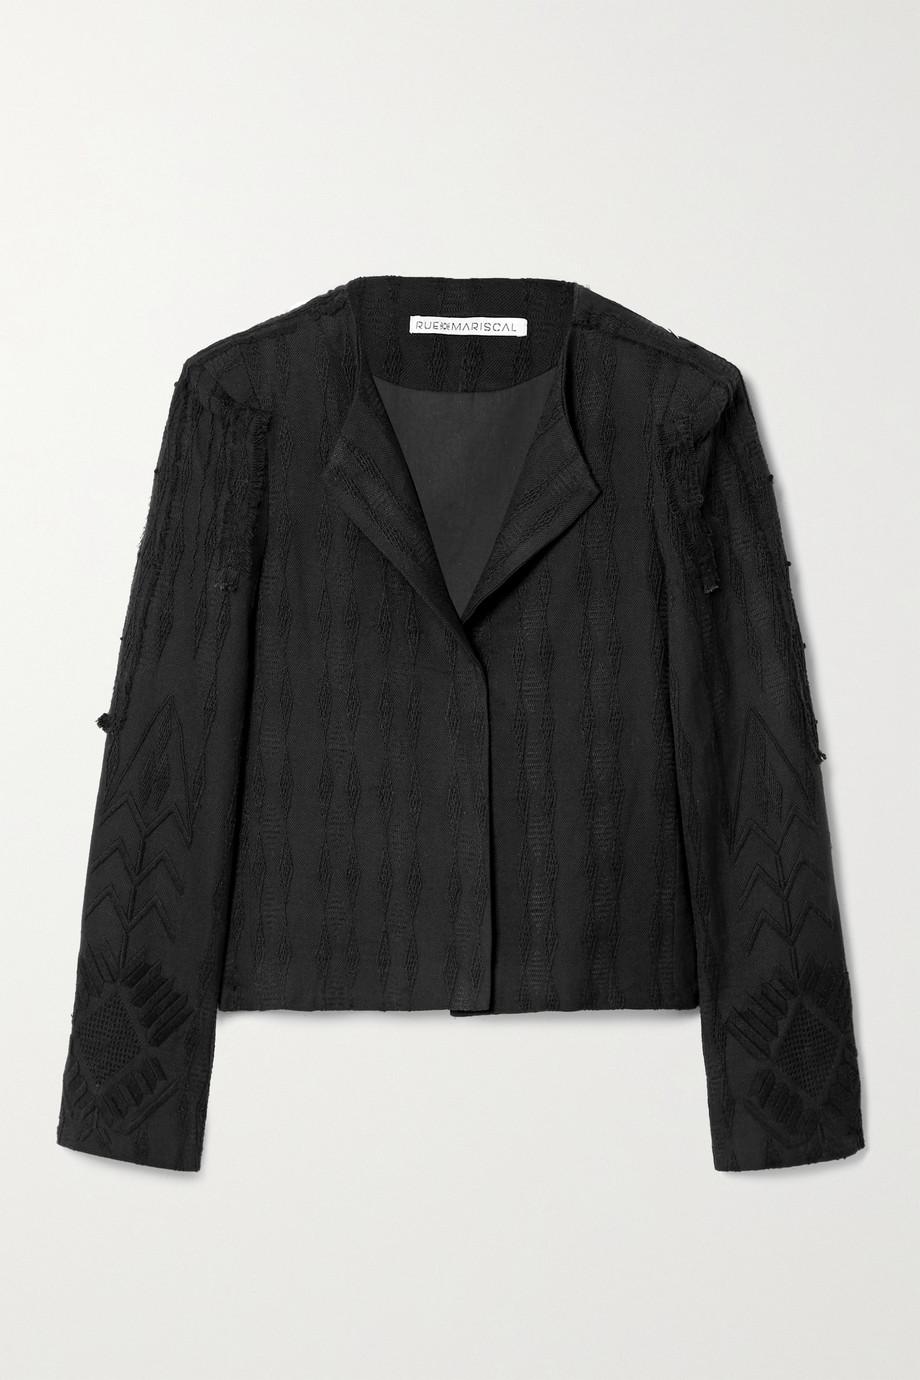 Rue Mariscal Embroidered cotton-canvas blazer